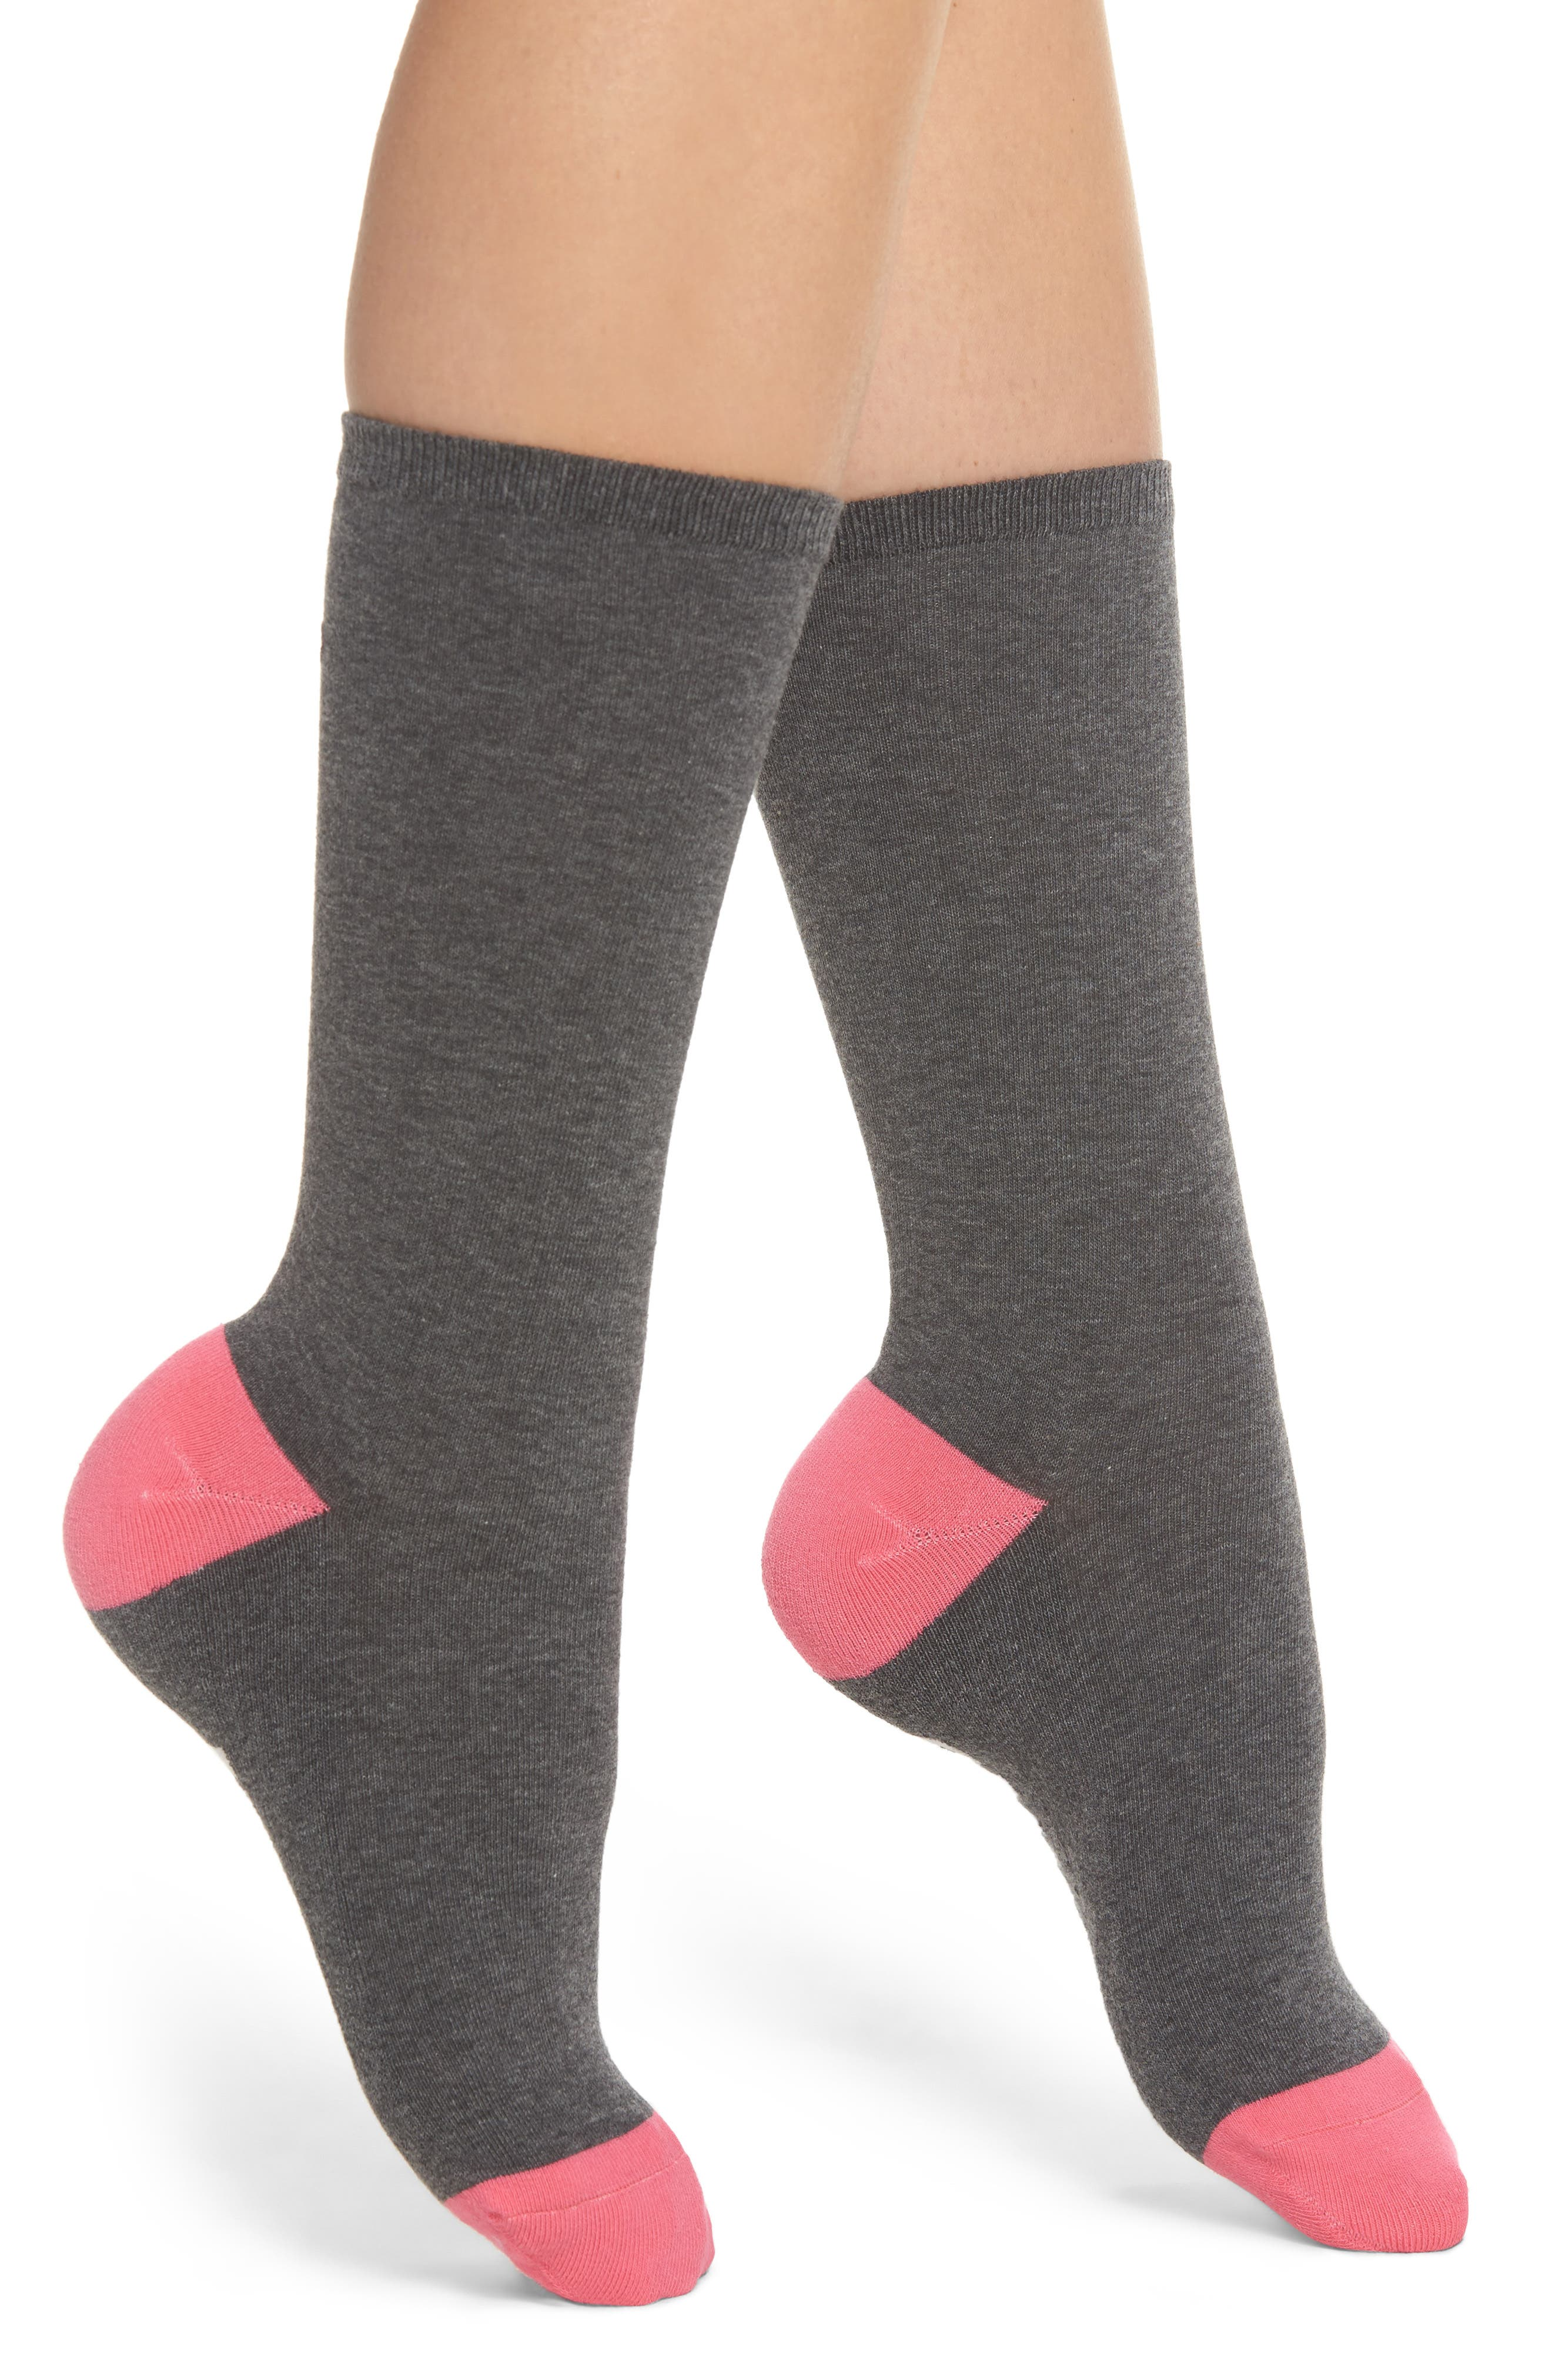 Keep Vibing Crew Socks,                             Main thumbnail 1, color,